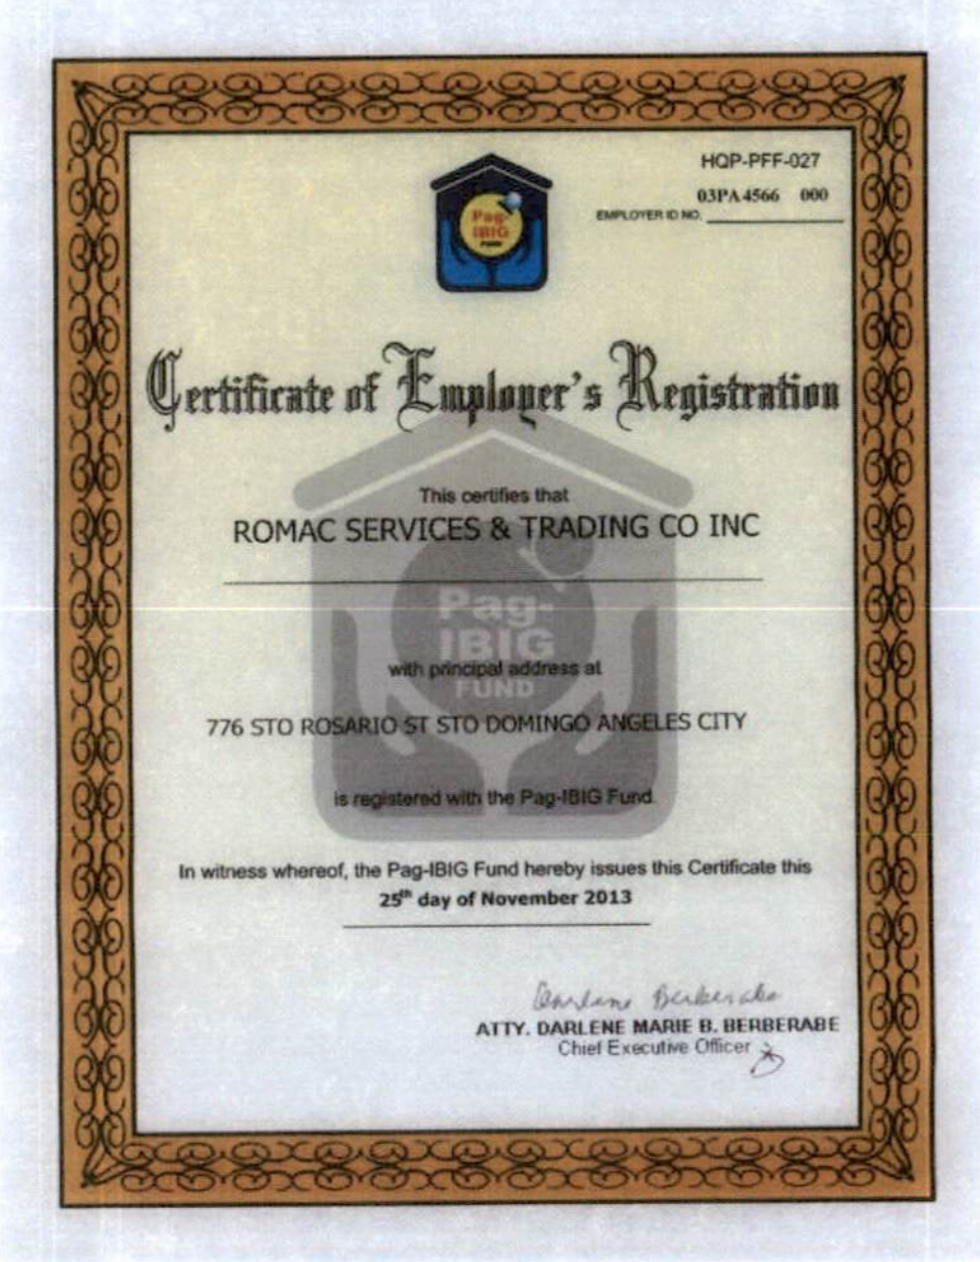 Pag-ibig Registration